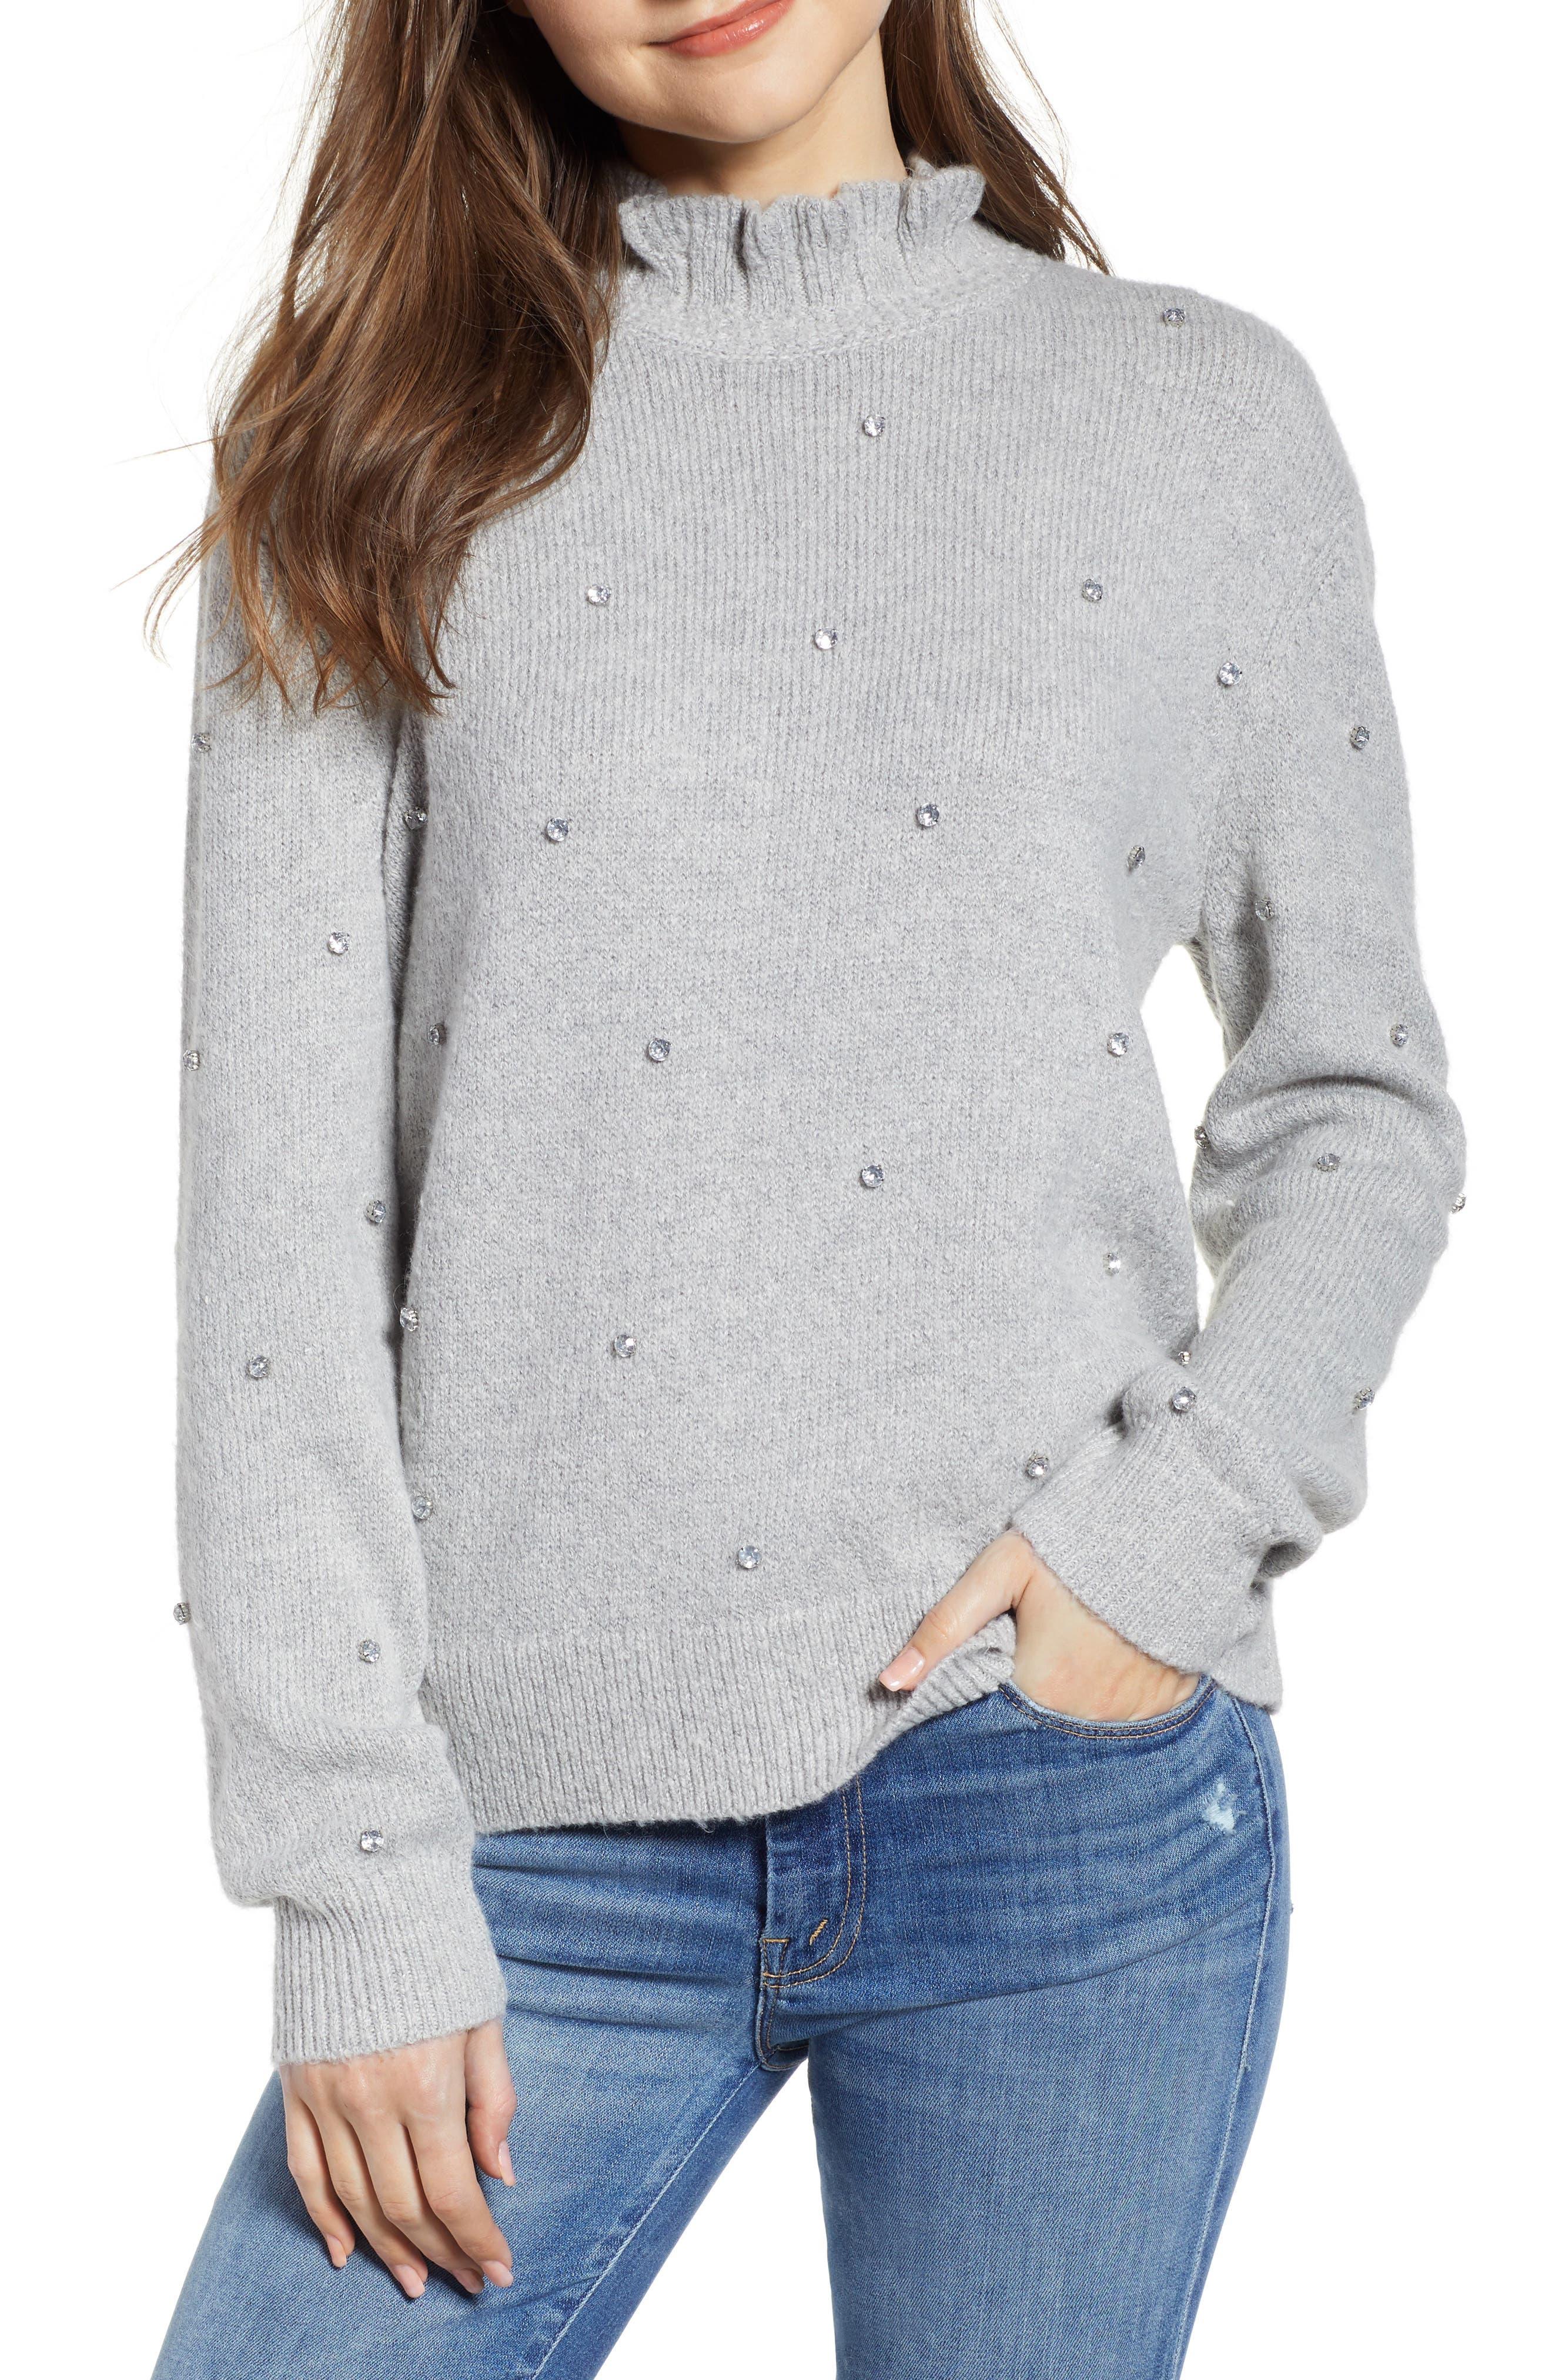 Embellished Ruffle Neck Sweater, Main, color, GREY LIGHT HEATHER